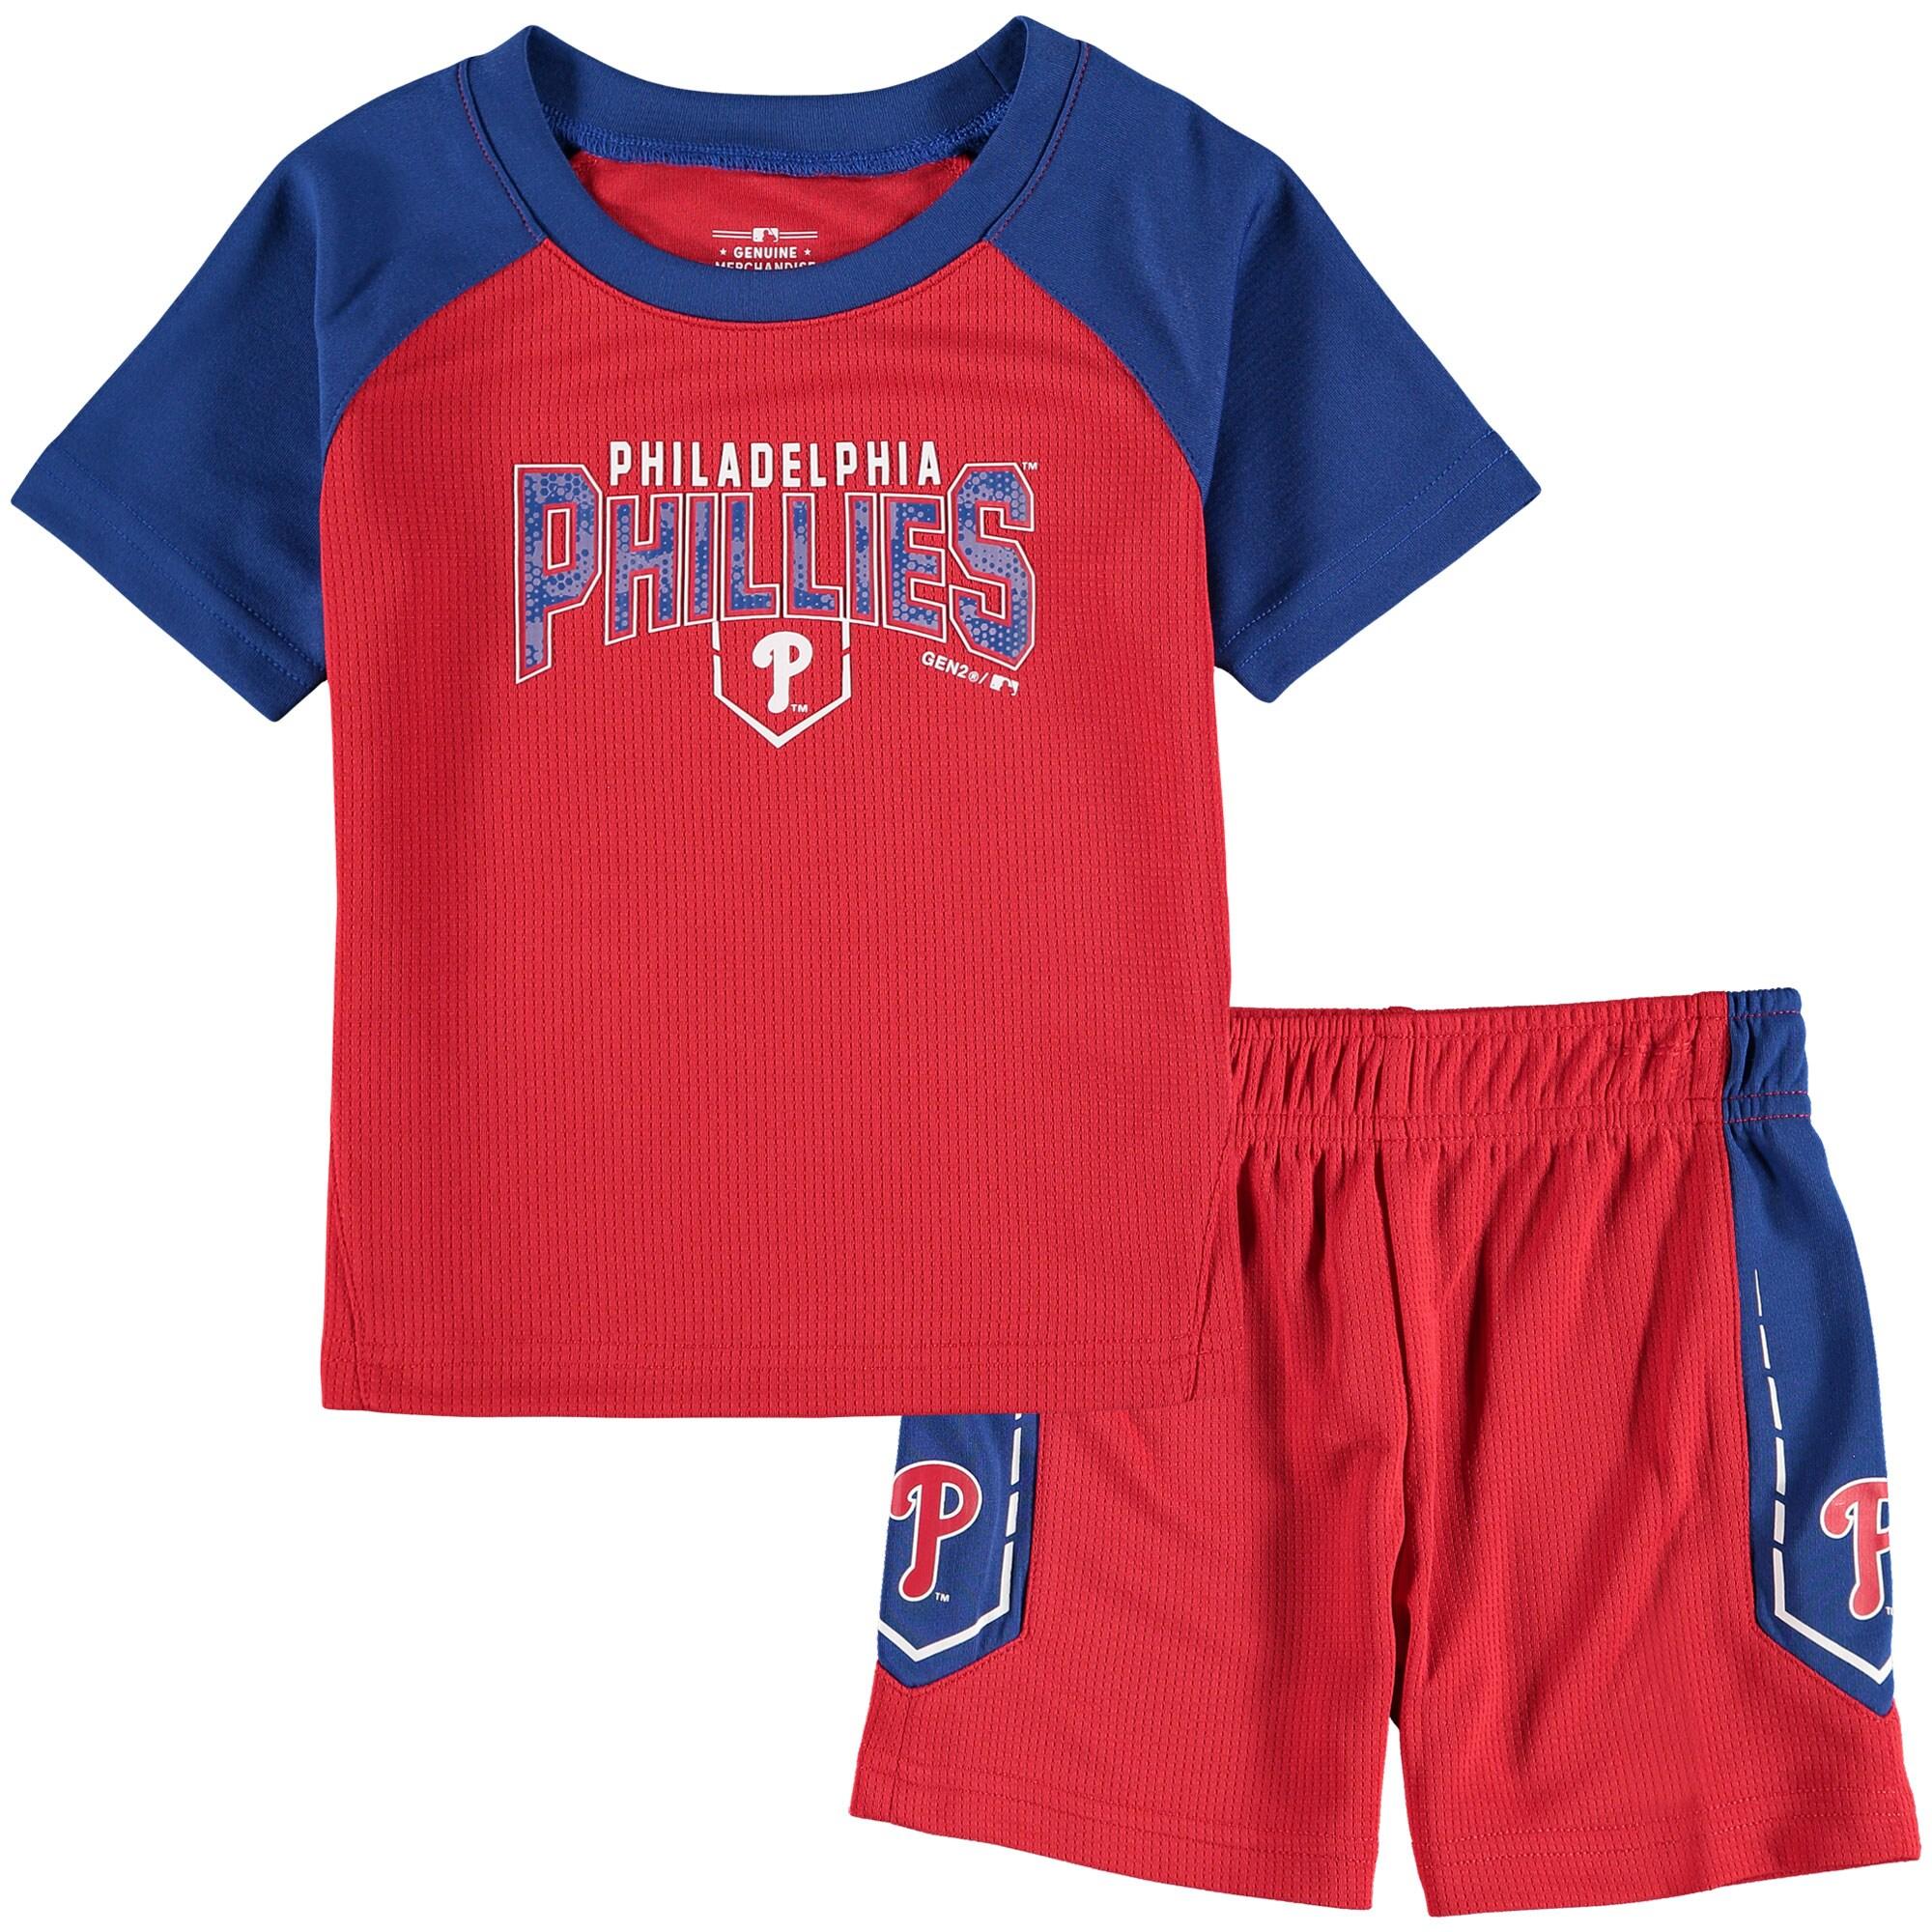 Philadelphia Phillies Infant Follow Through T-Shirt & Shorts Set - Red/Royal